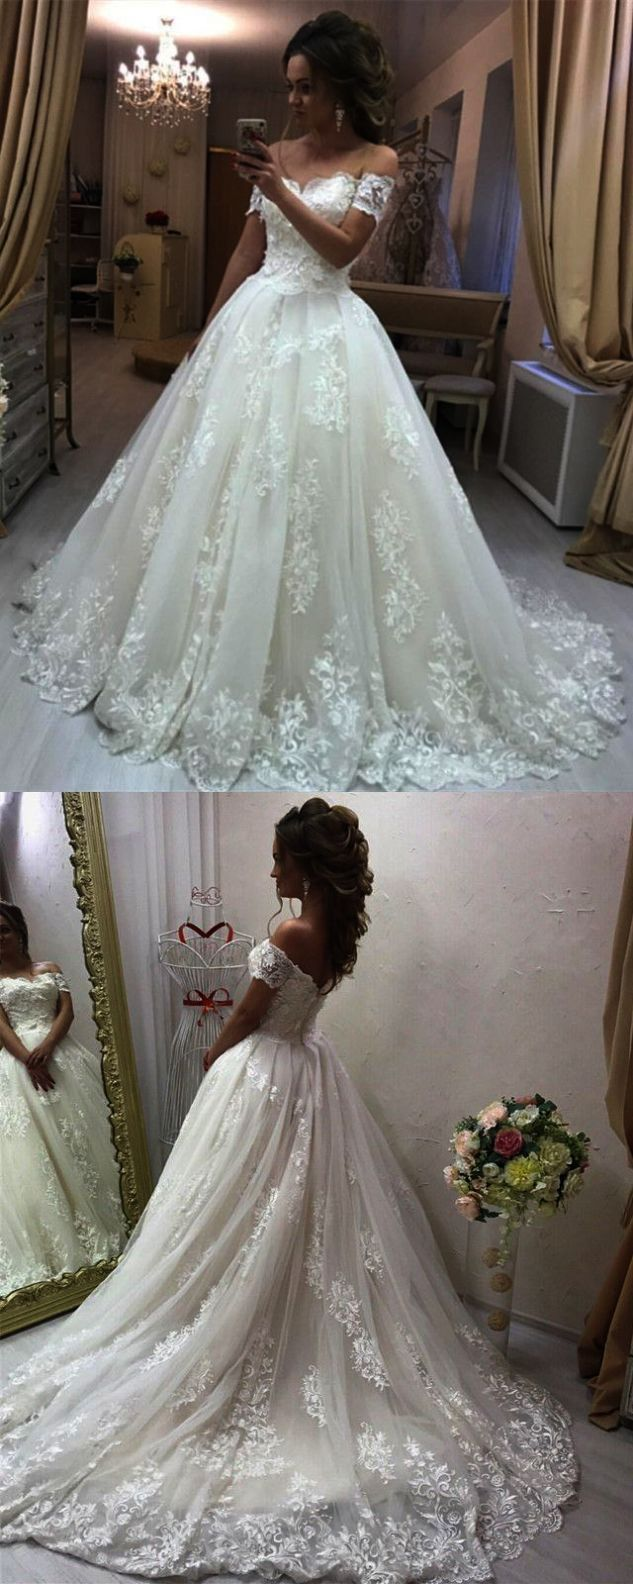 Lace sweetheart wedding dress long sleeve lace applique mermaid